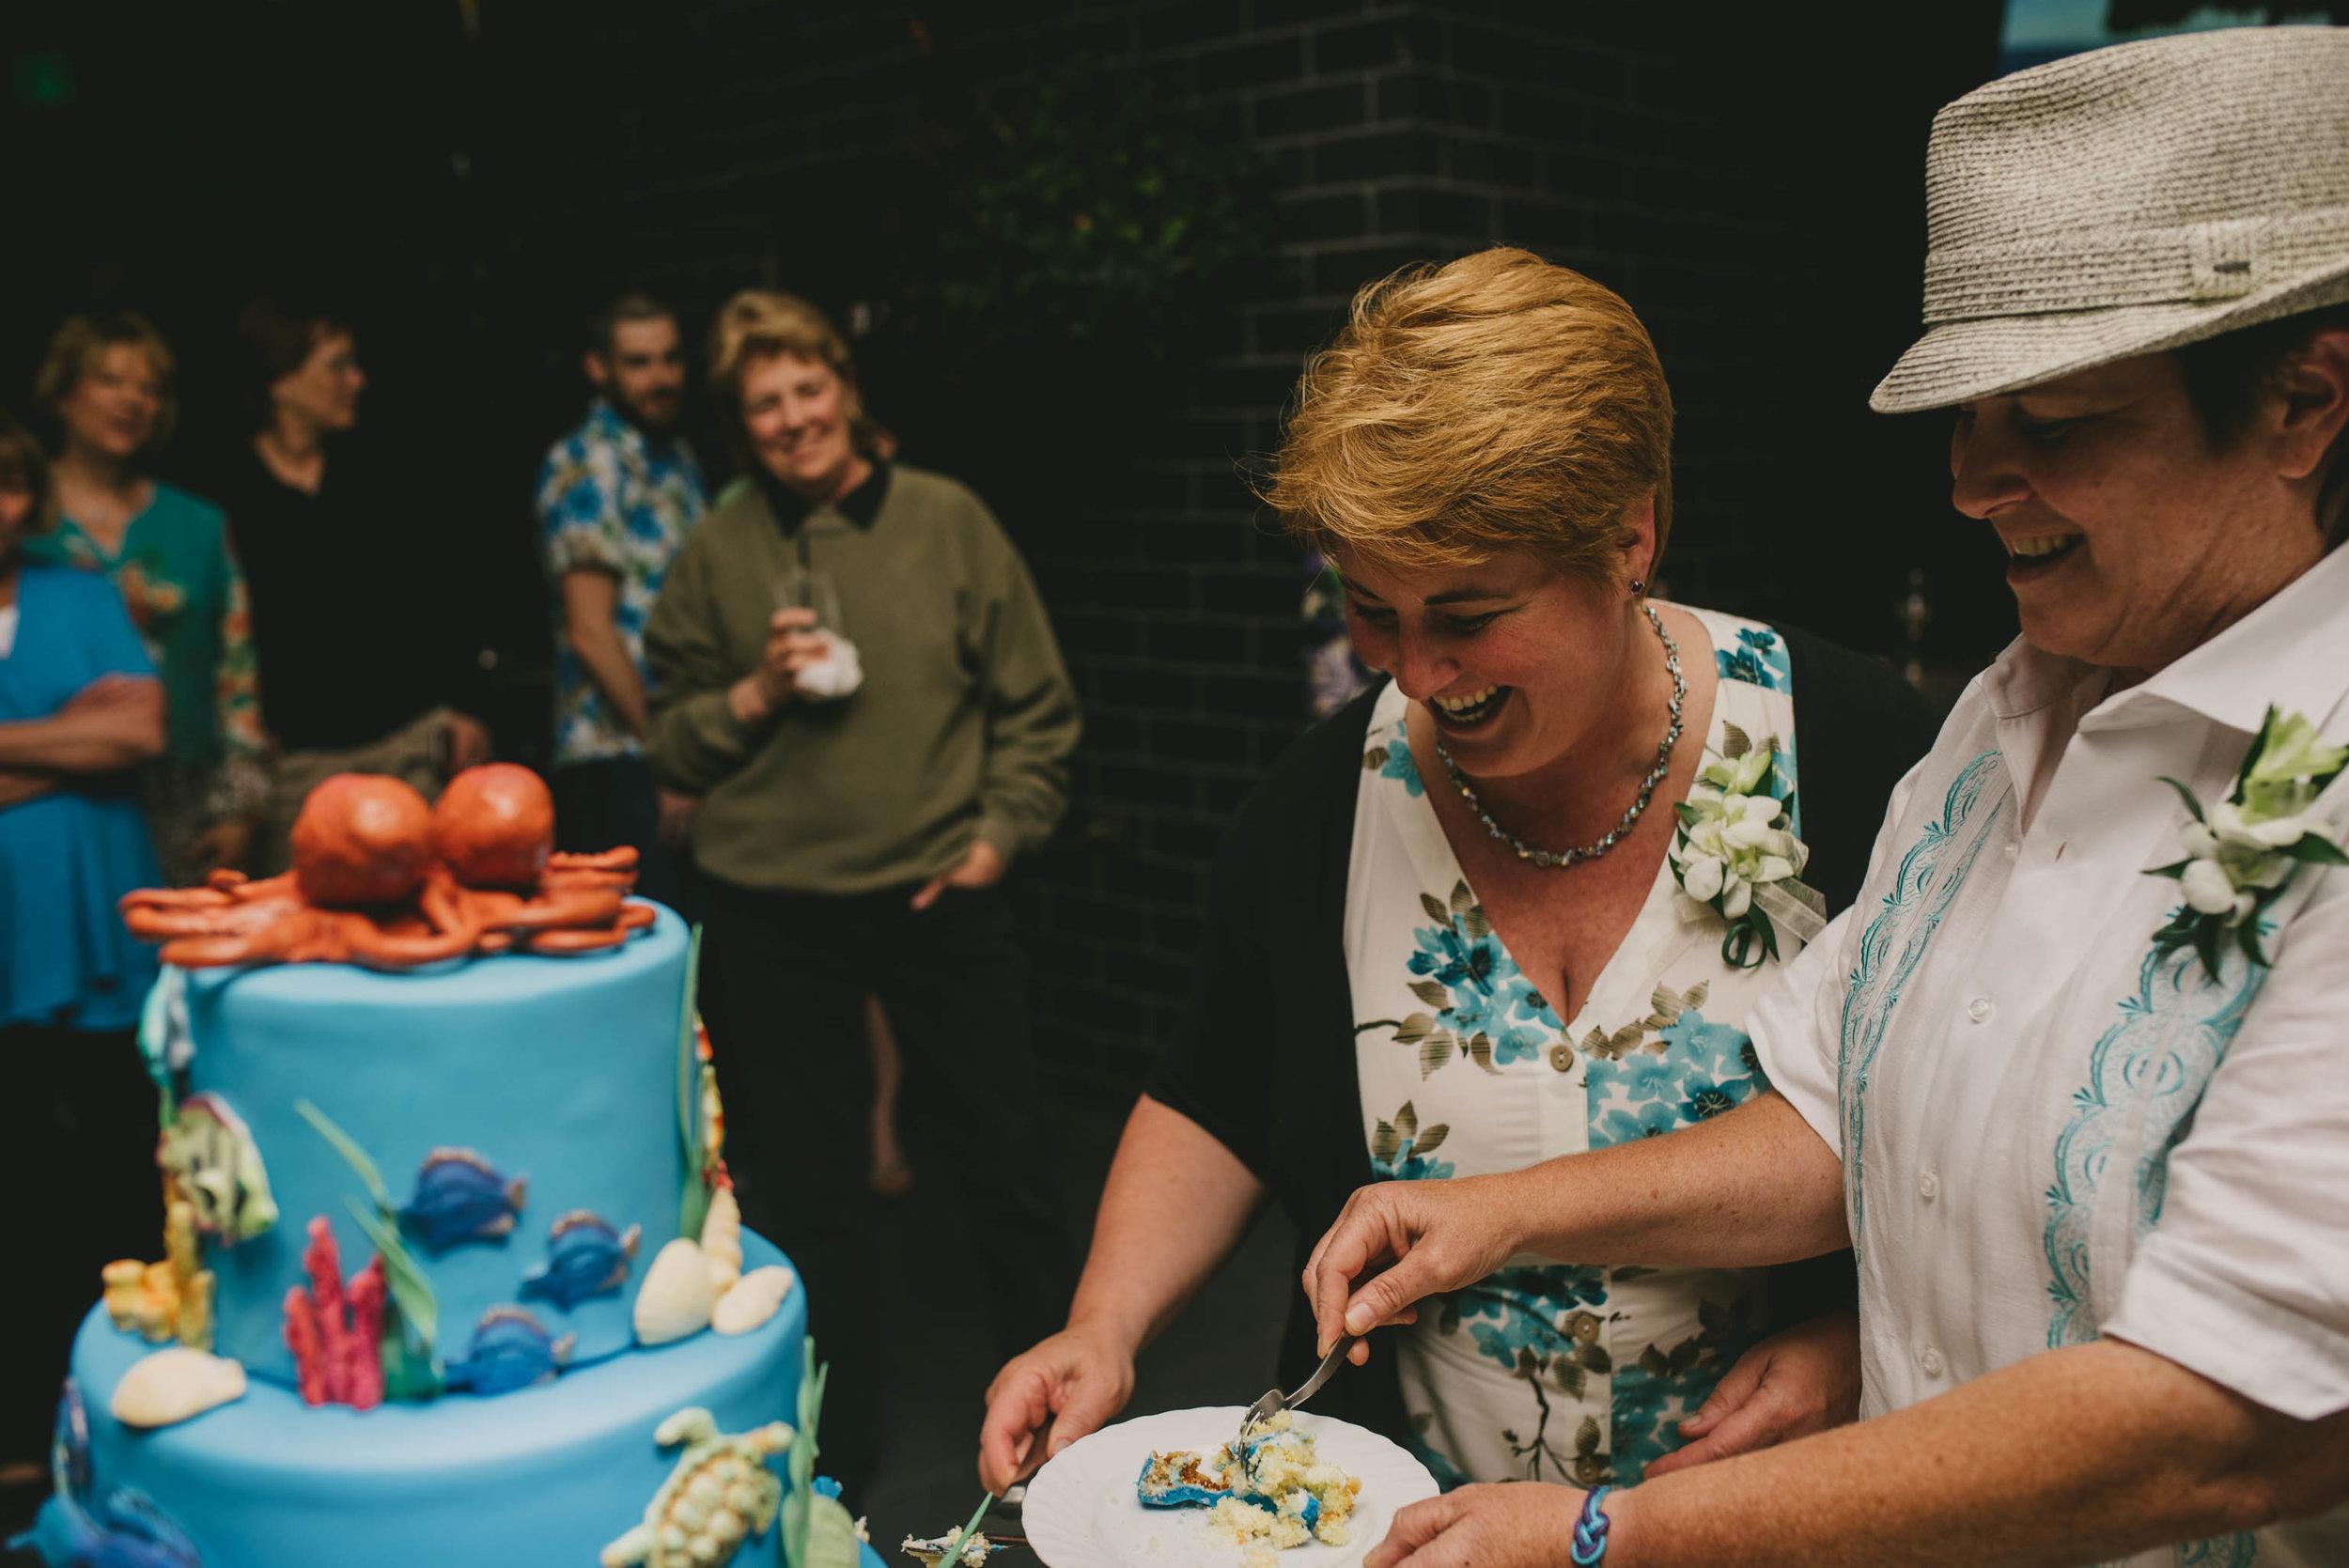 solas-restaurant-raleigh-same-sex-wedding-cake-cutting-photo.jpg